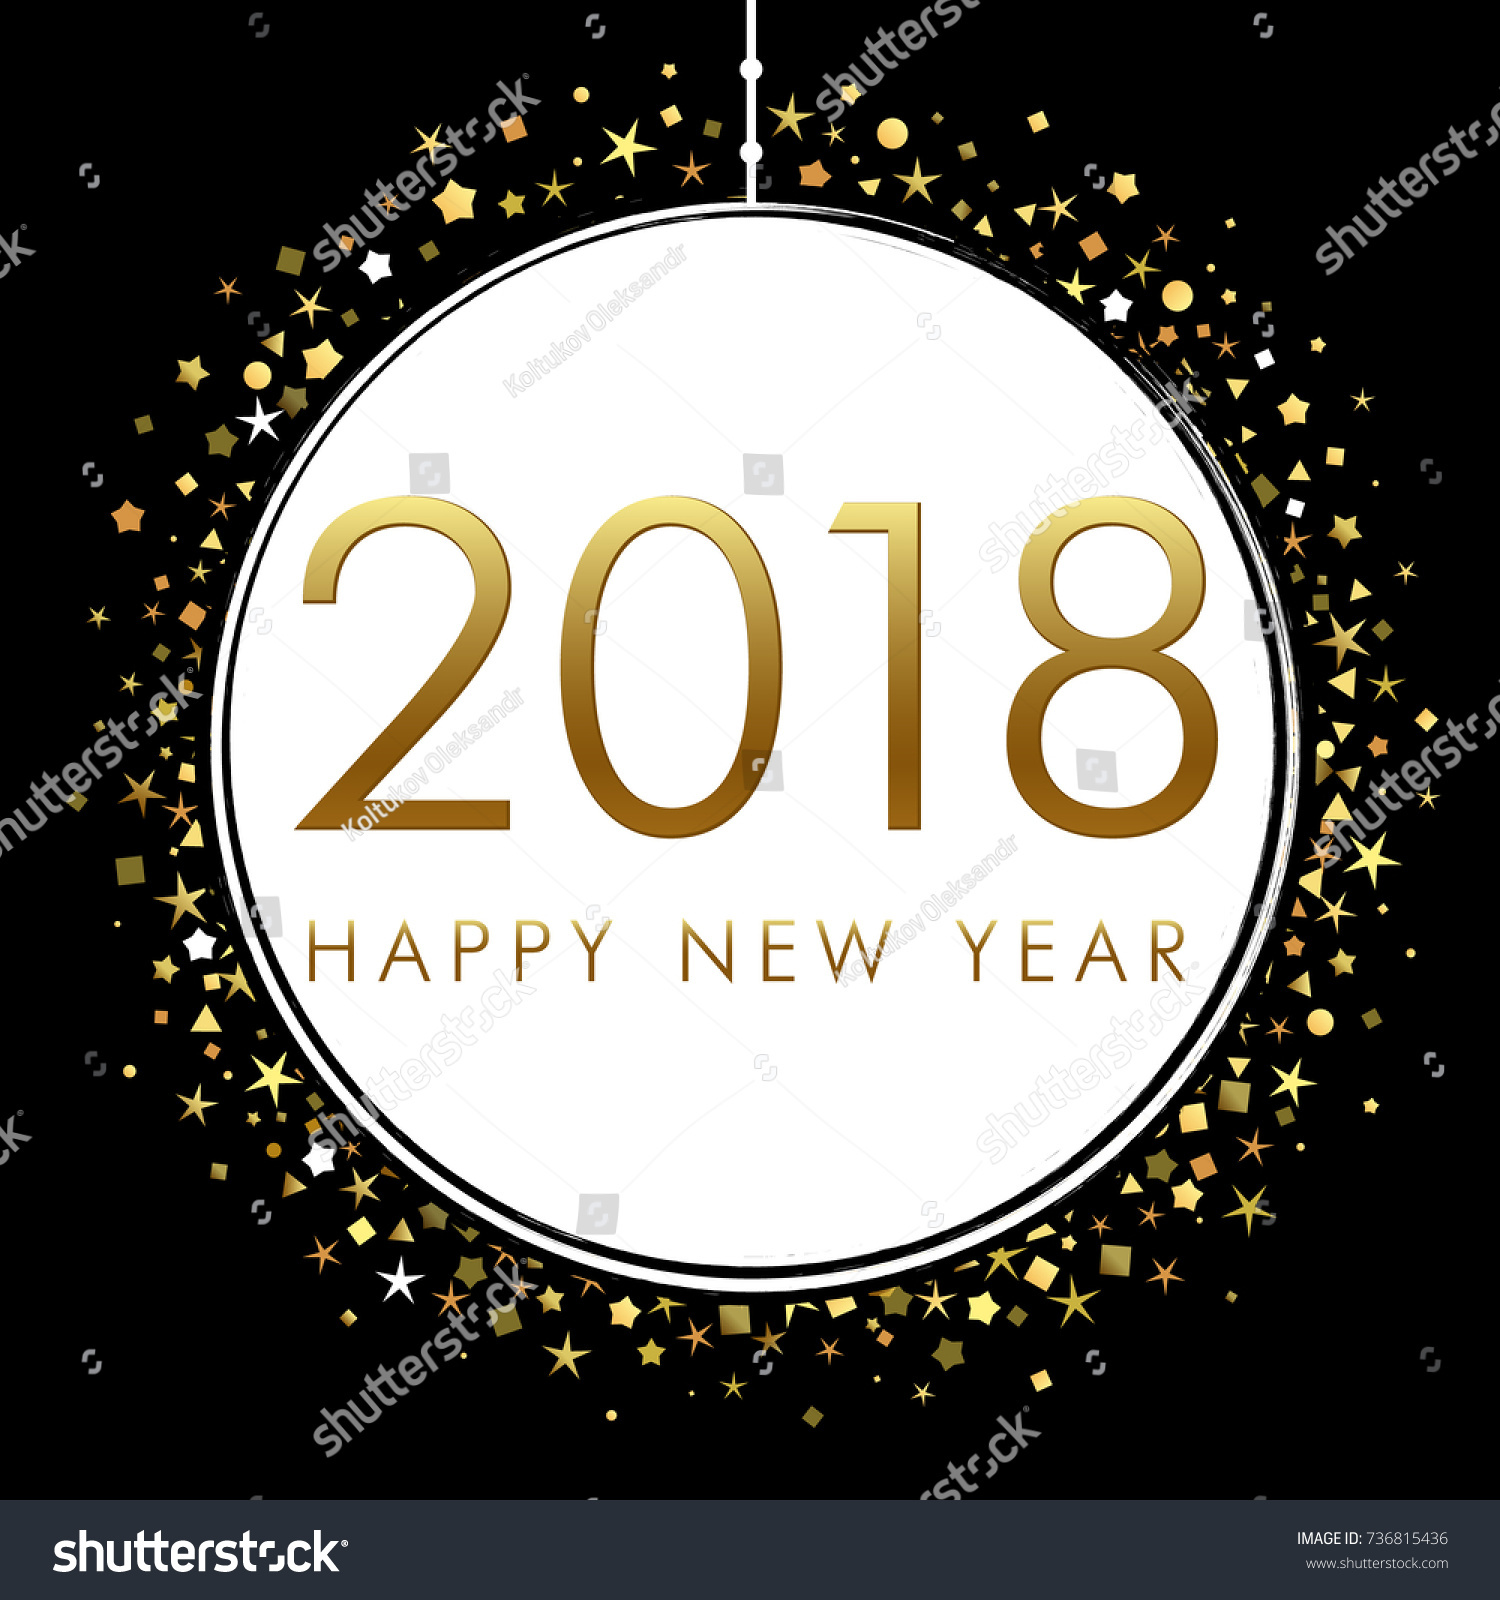 Happy New Year 2018 Festive Vip Stock Vector Royalty Free